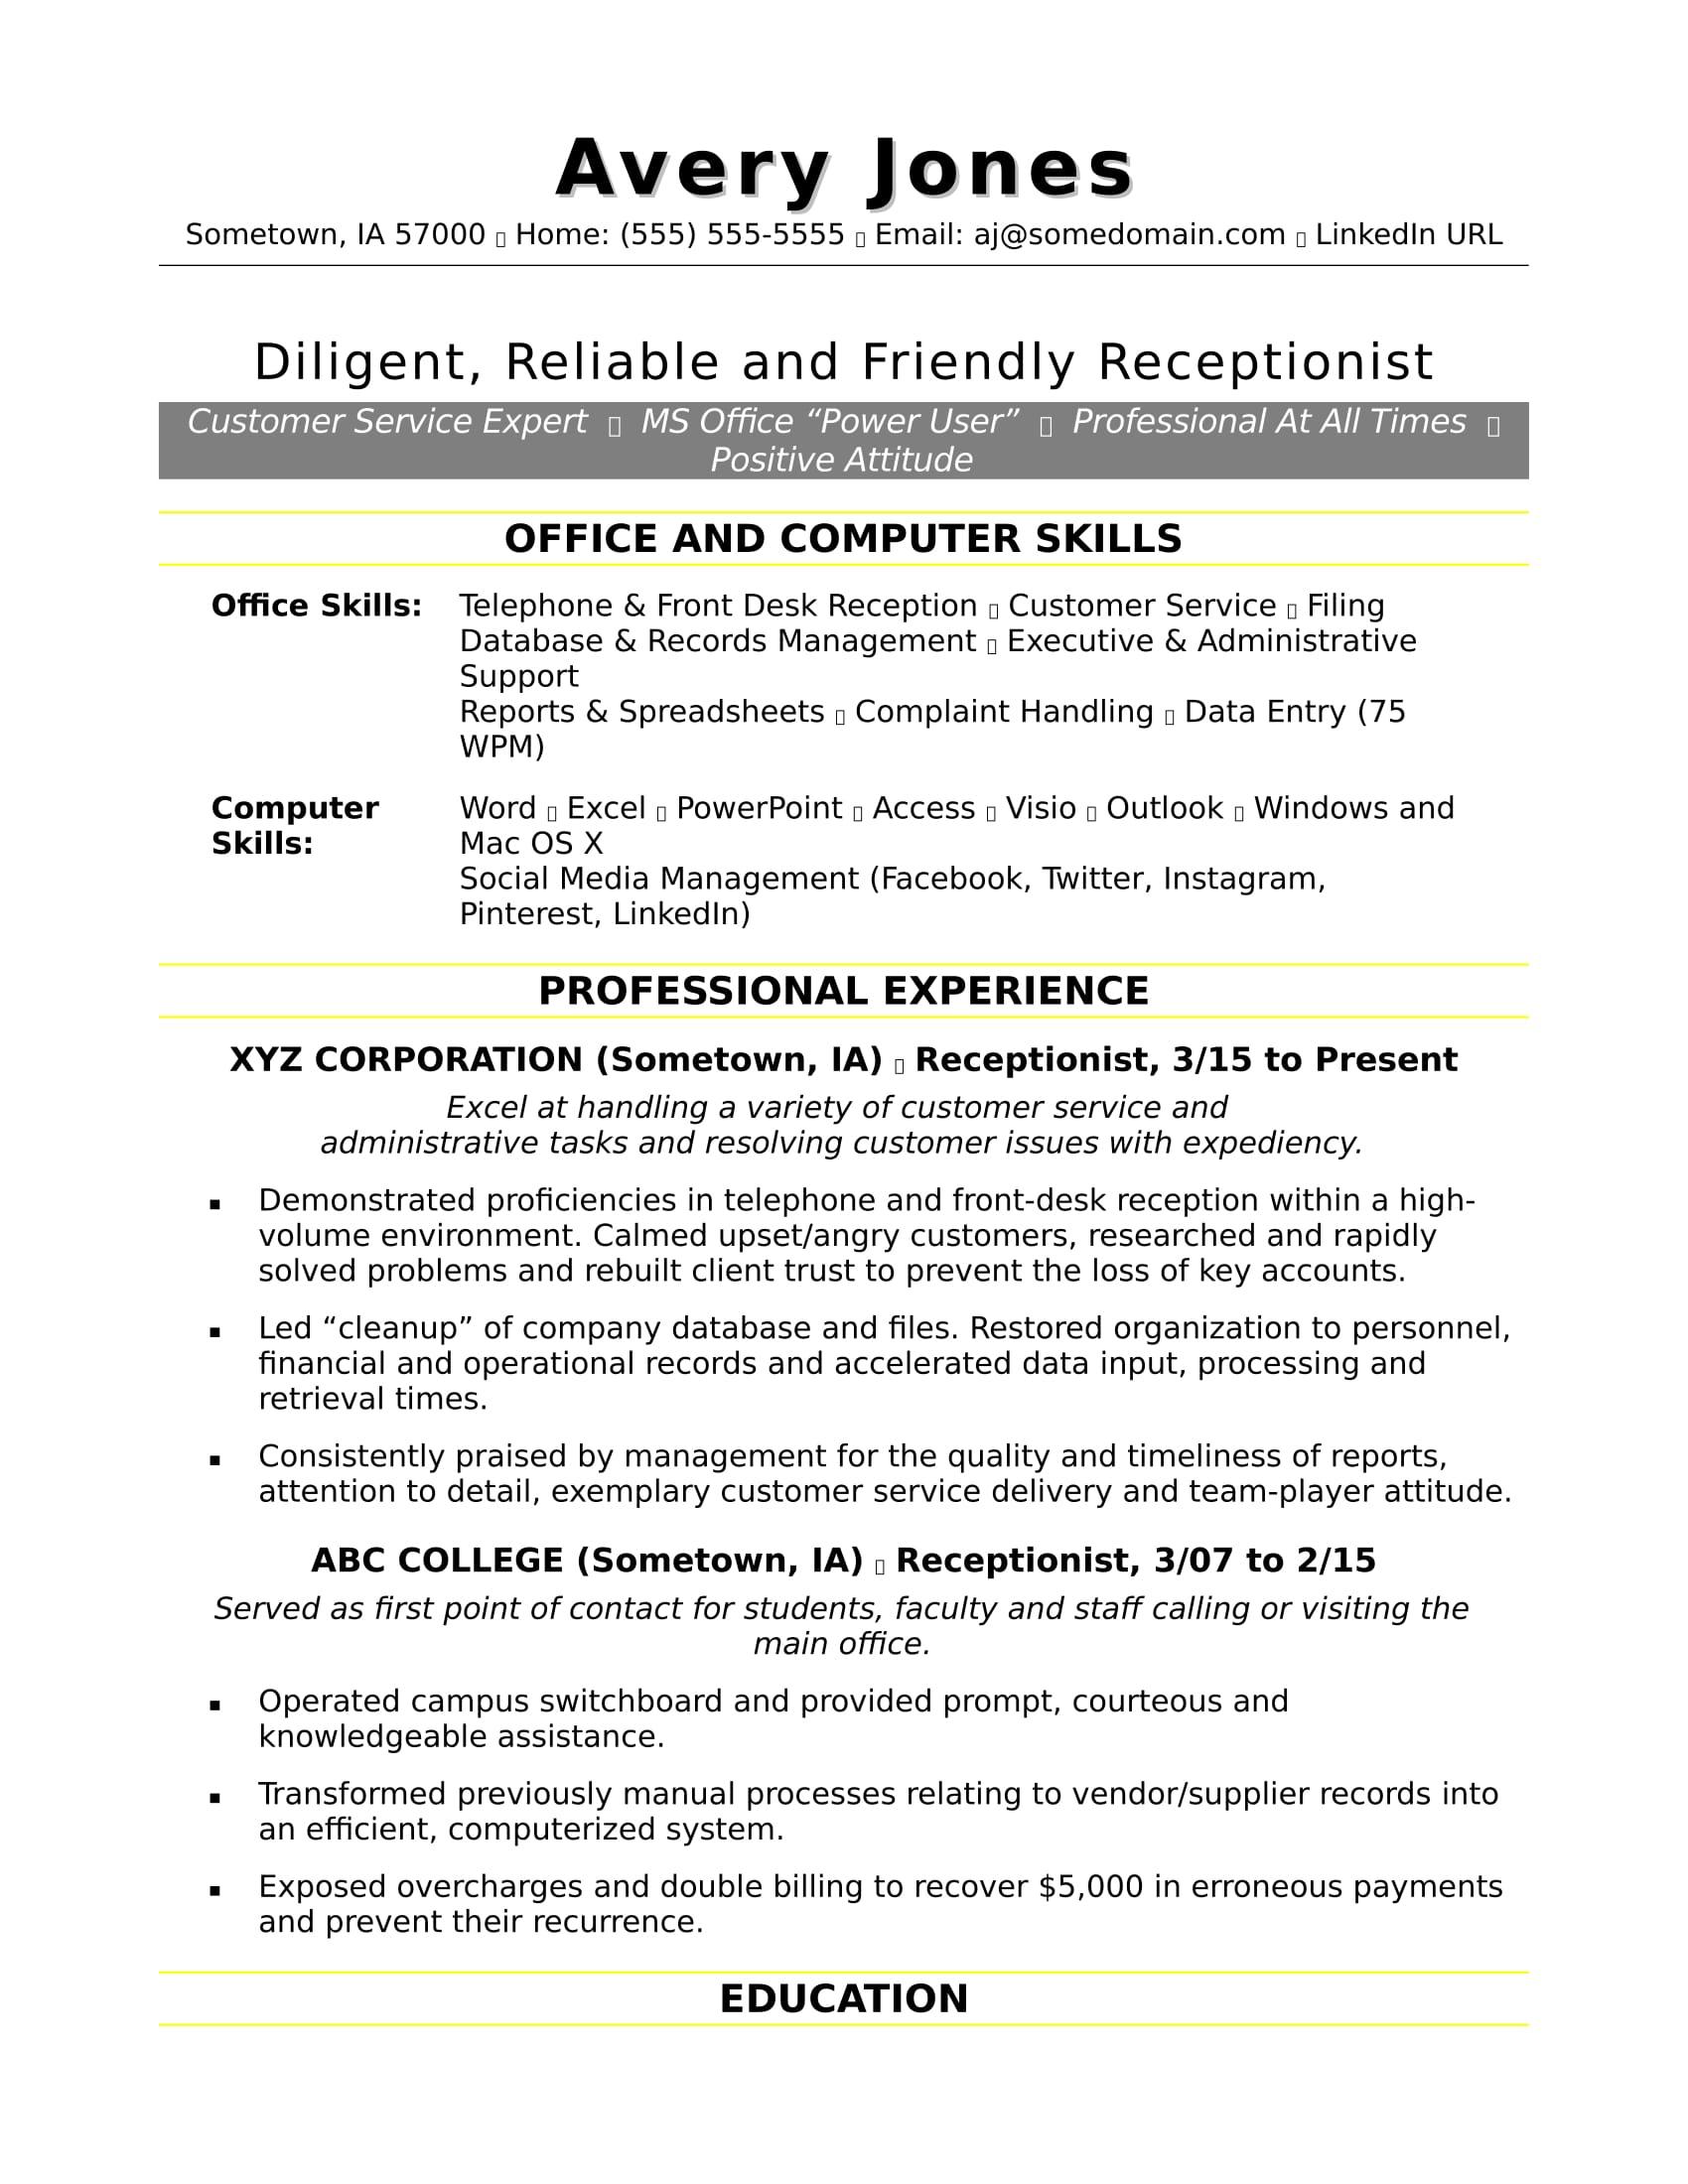 Receptionist Resume Sample | Monster.com